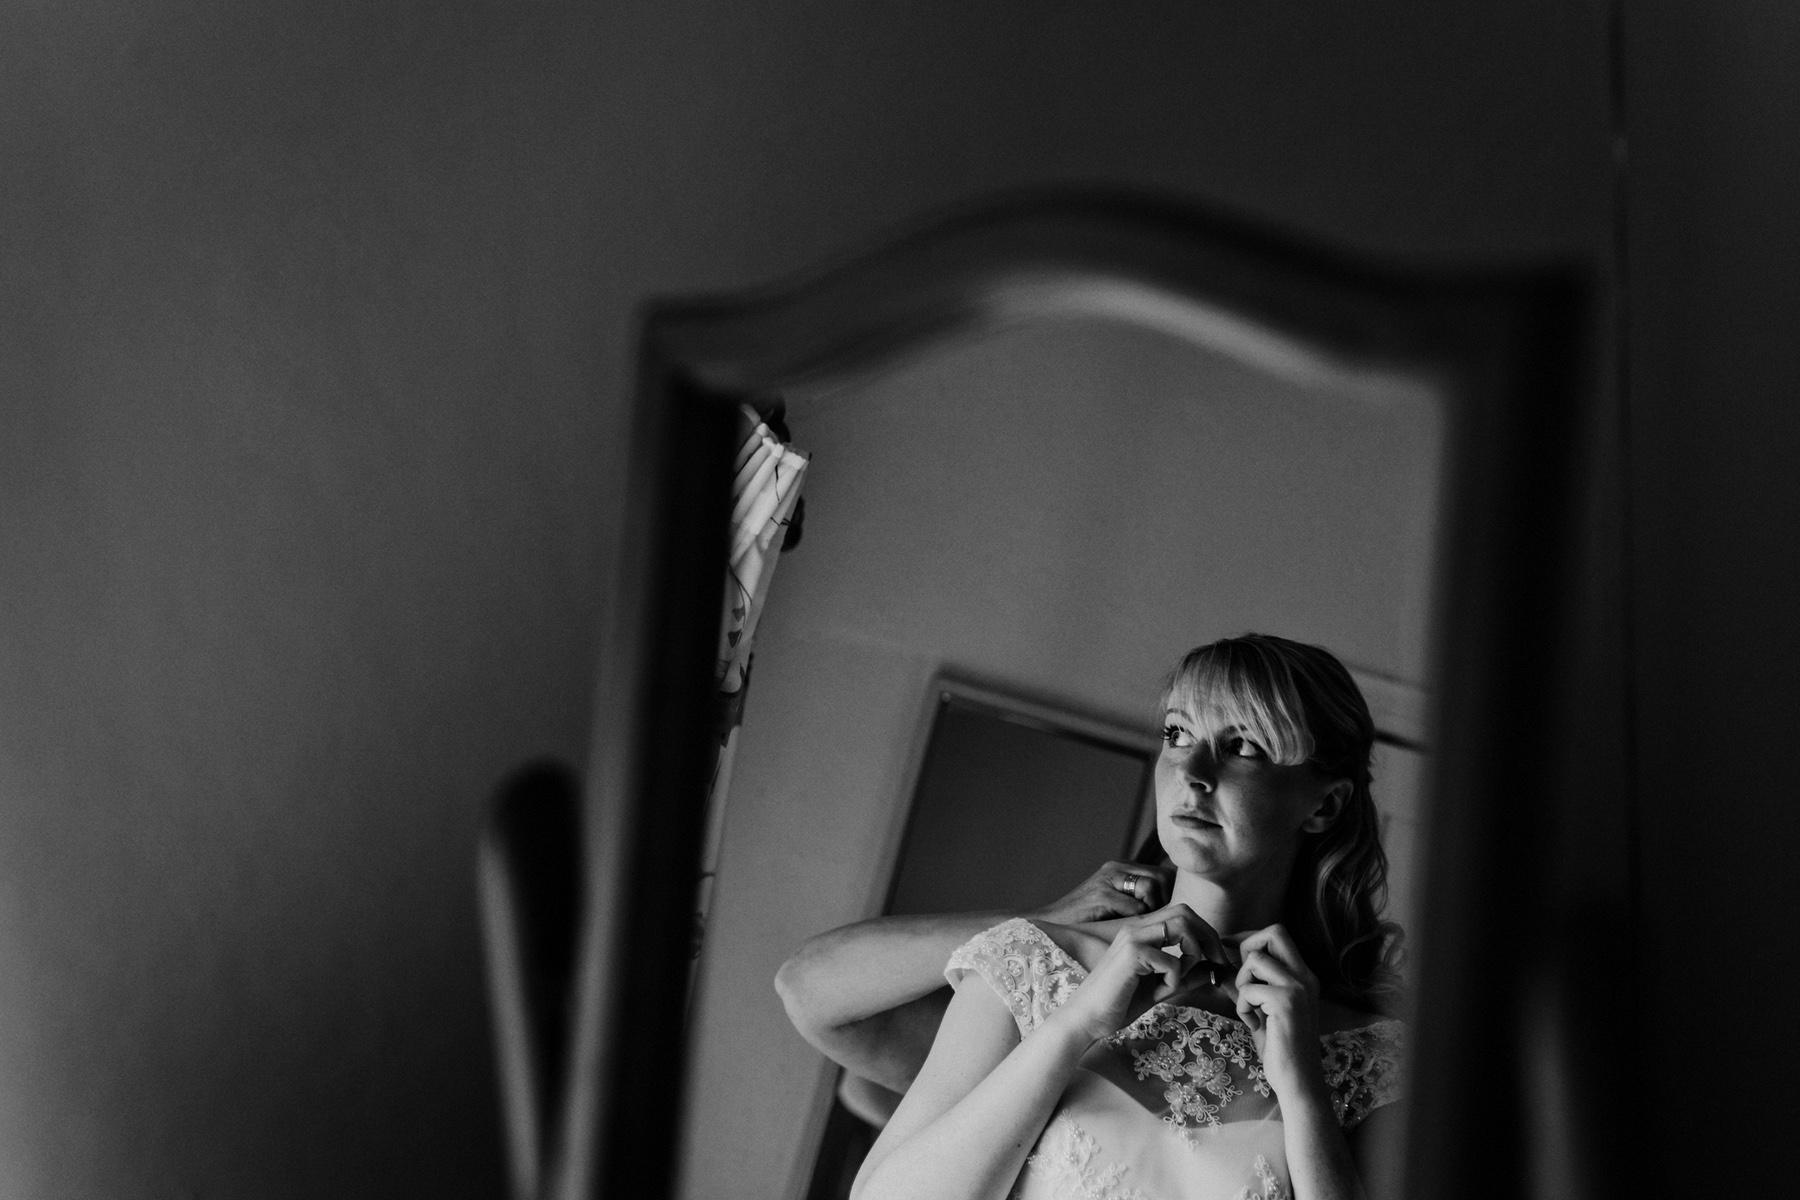 Snowdonia-Wales-Wedding-Photos-0301.jpg